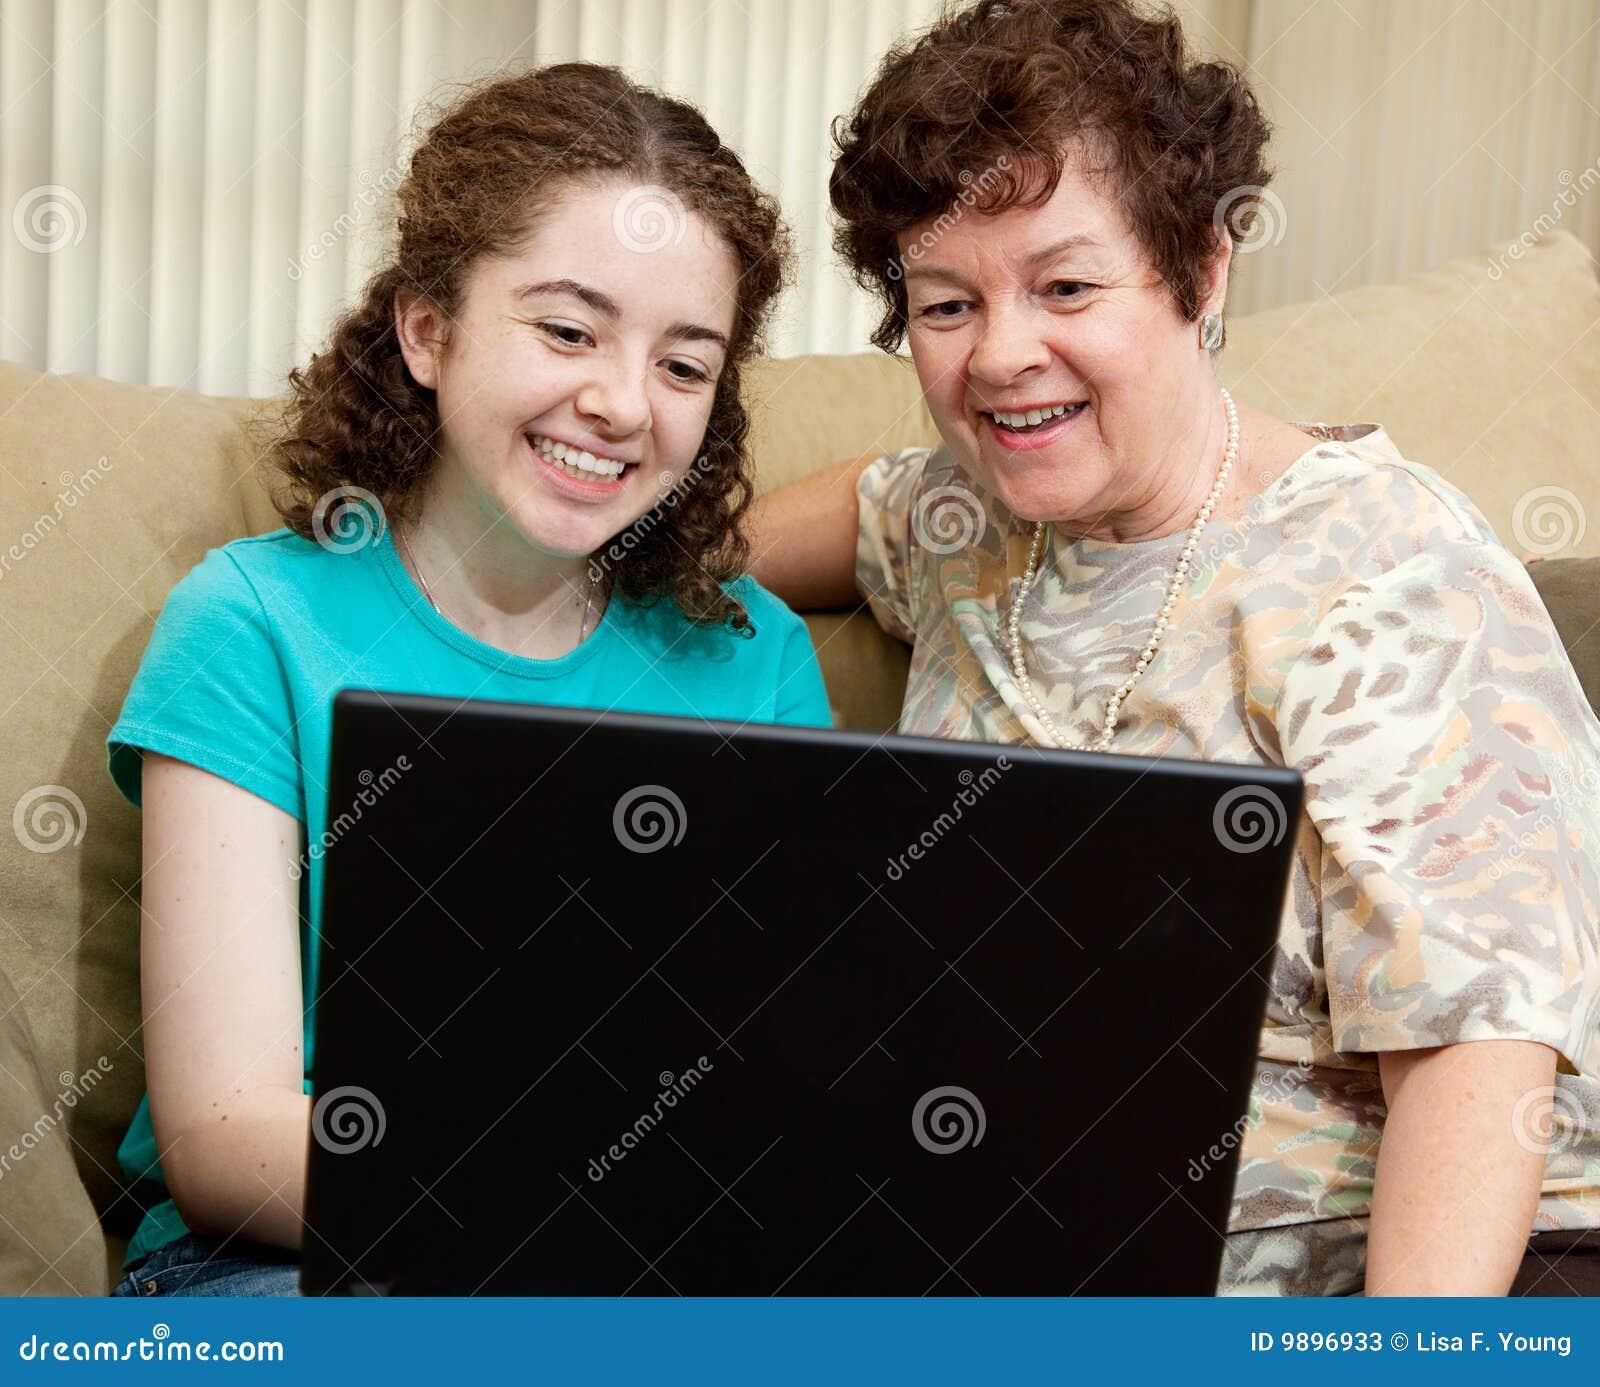 Girl. yeah teen using computer some spunk